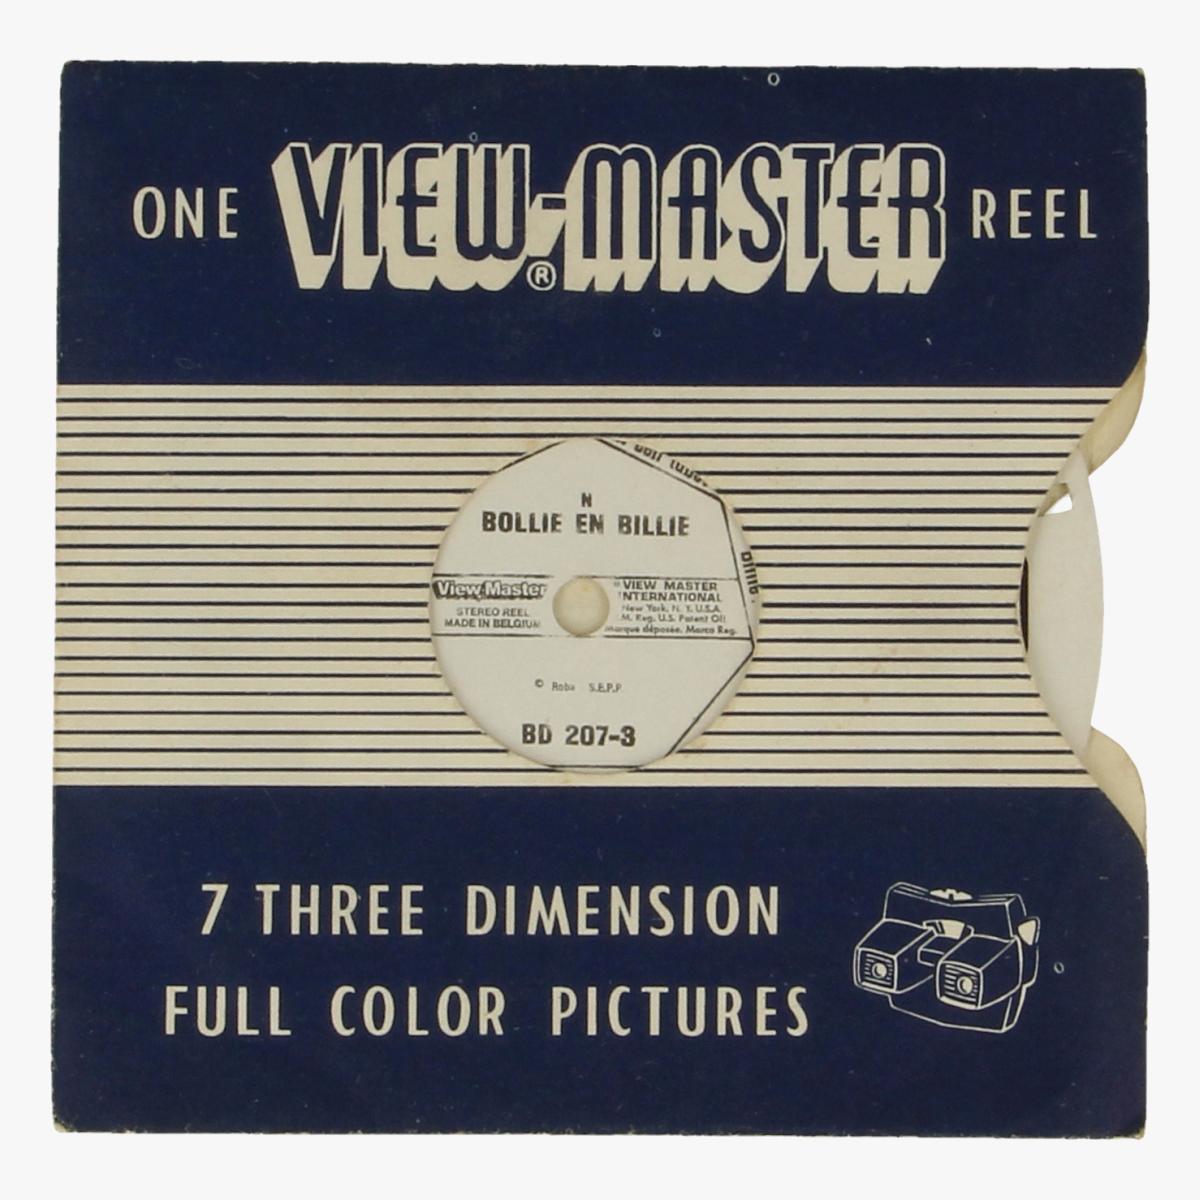 Afbeeldingen van View-master Bollie en Billie. Nr. BD 207-3